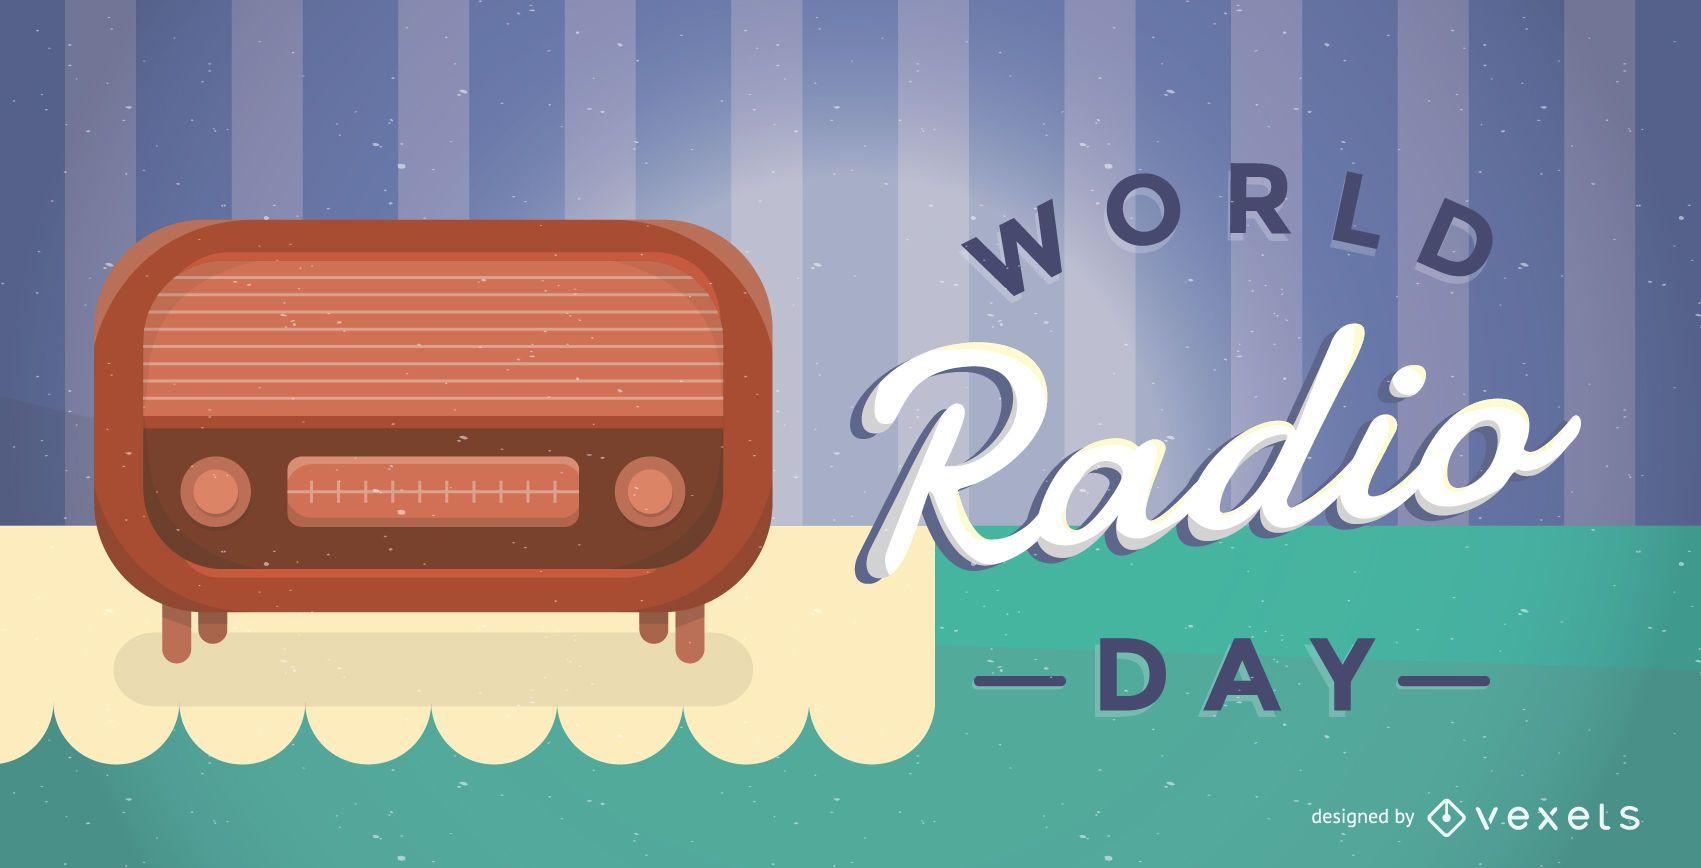 World Radio Day poster illustration